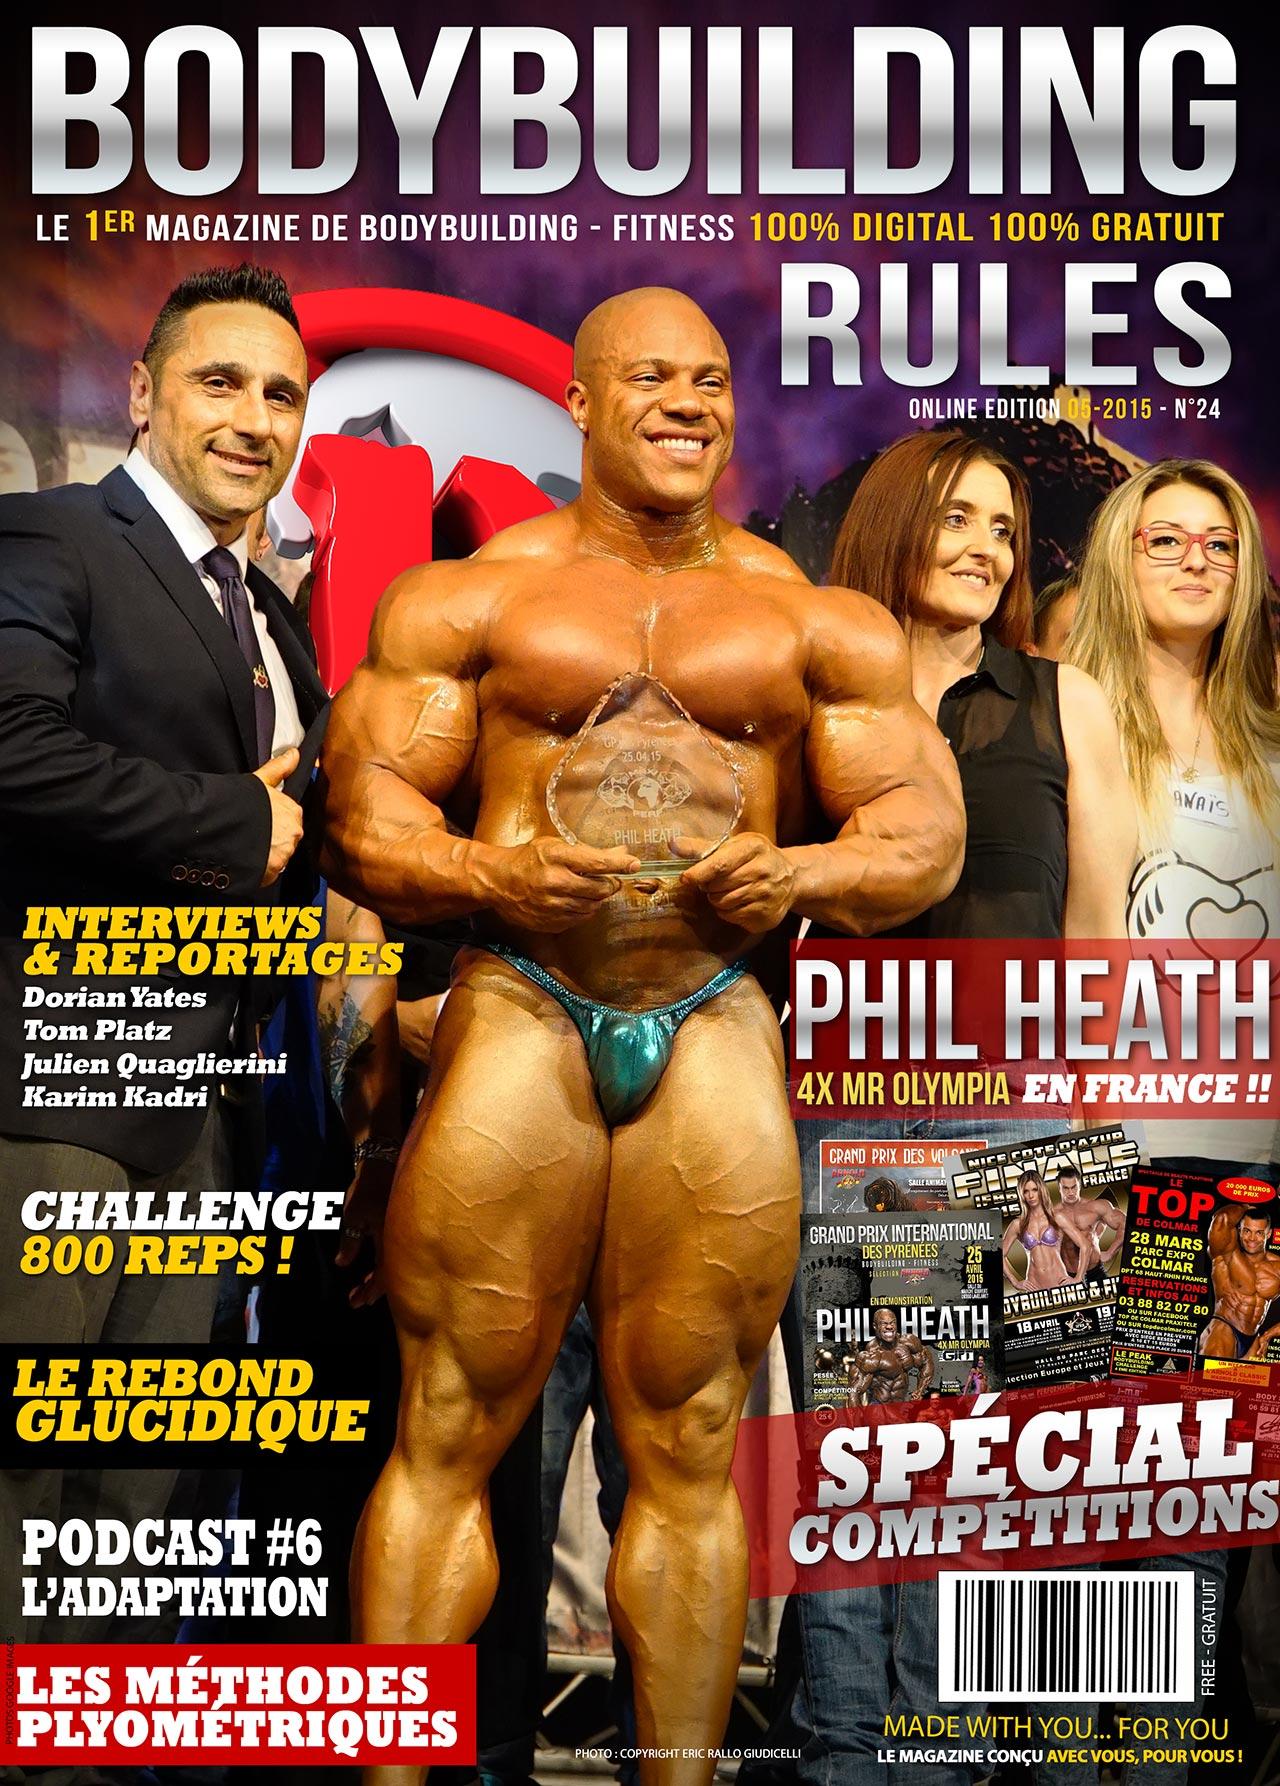 bodybuilding - www.bodybuilding-rules.com le magazine interactif GRATUIT  1bbrM24